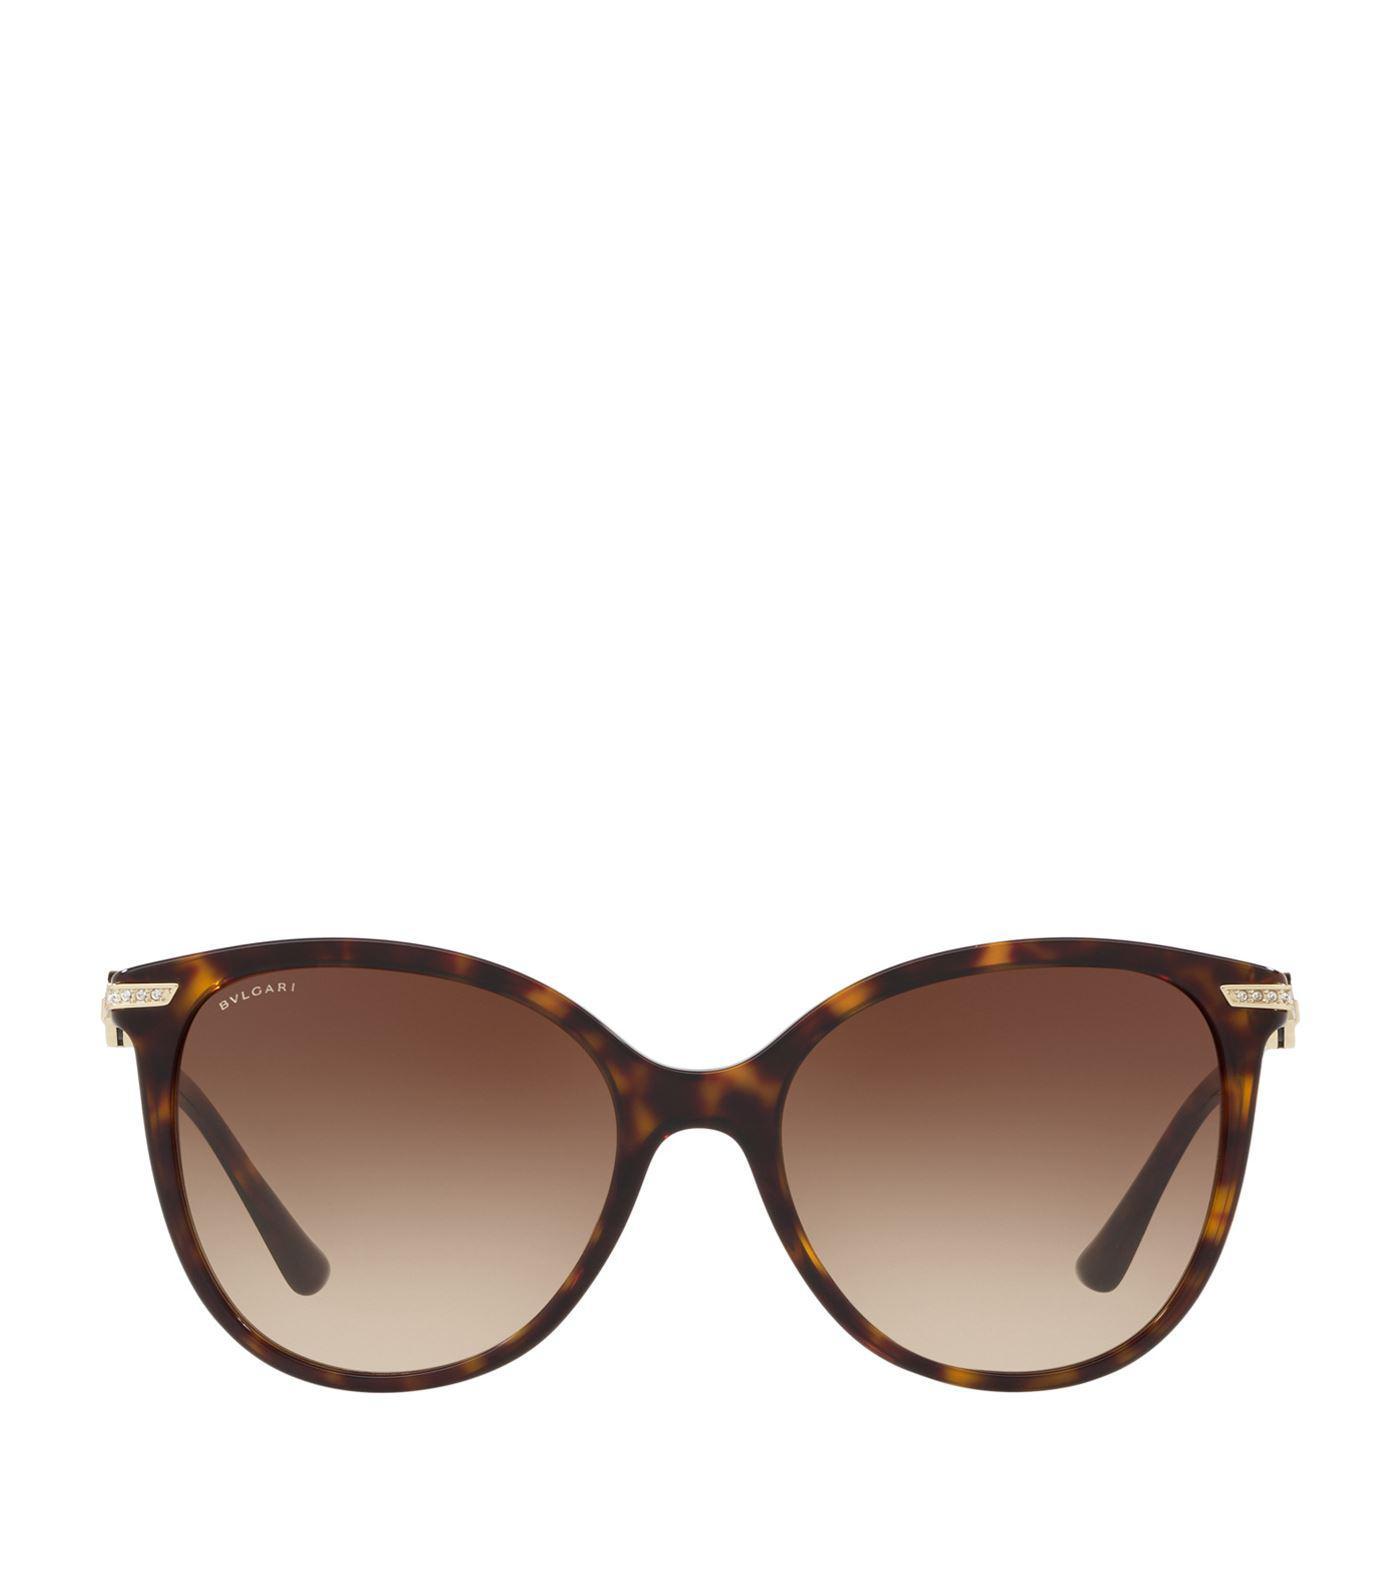 d78954d357e51 BVLGARI - Brown Serpenti Butterfly Sunglasses - Lyst. View fullscreen